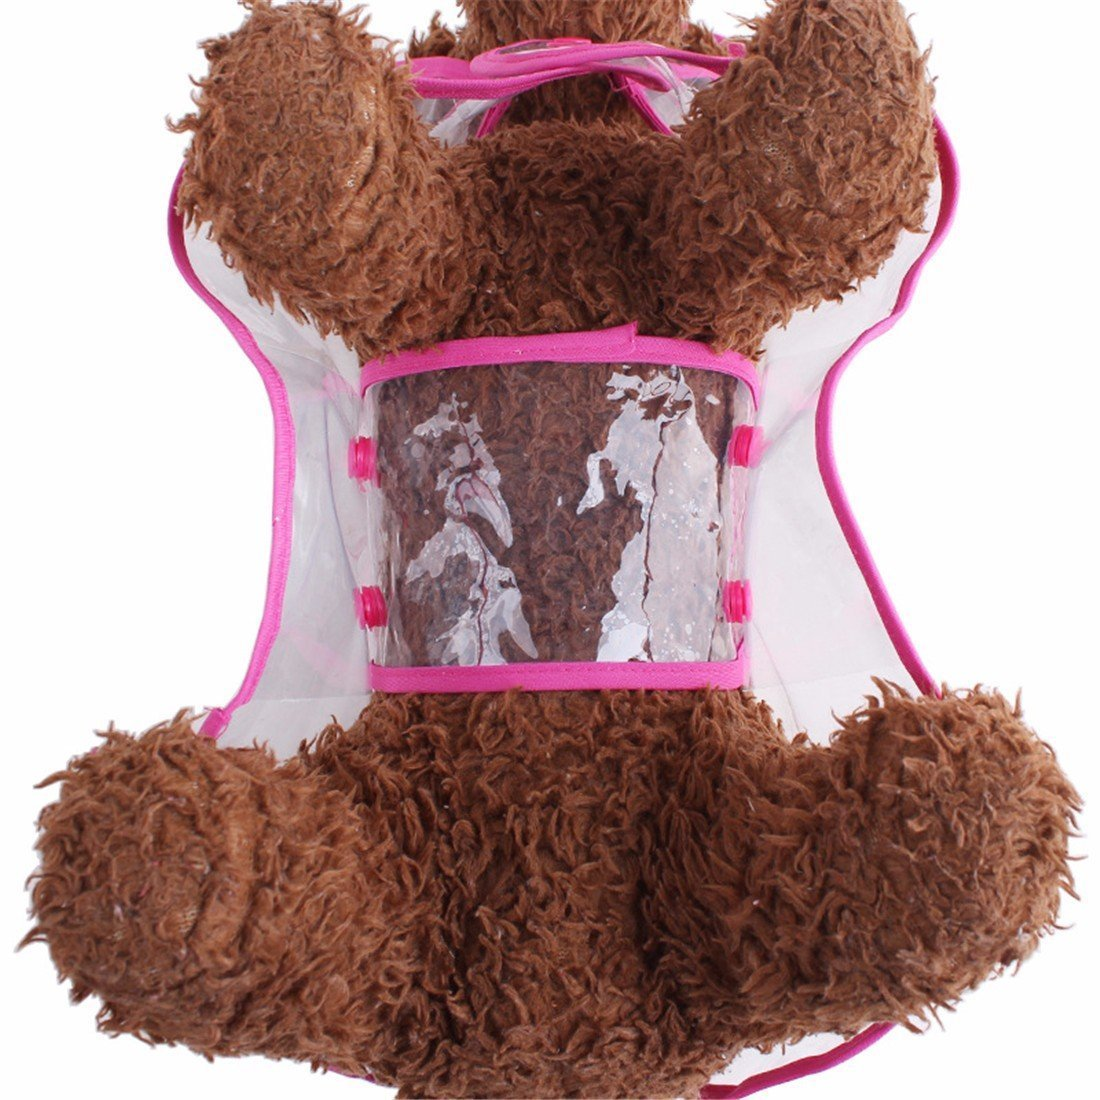 zoonpark/® Mascota Perro Chubasquero Poncho perro cachorro mascota ligero impermeable Teddy transparente pl/ástico Poncho chubasquero para peque/ño o mediano Perros